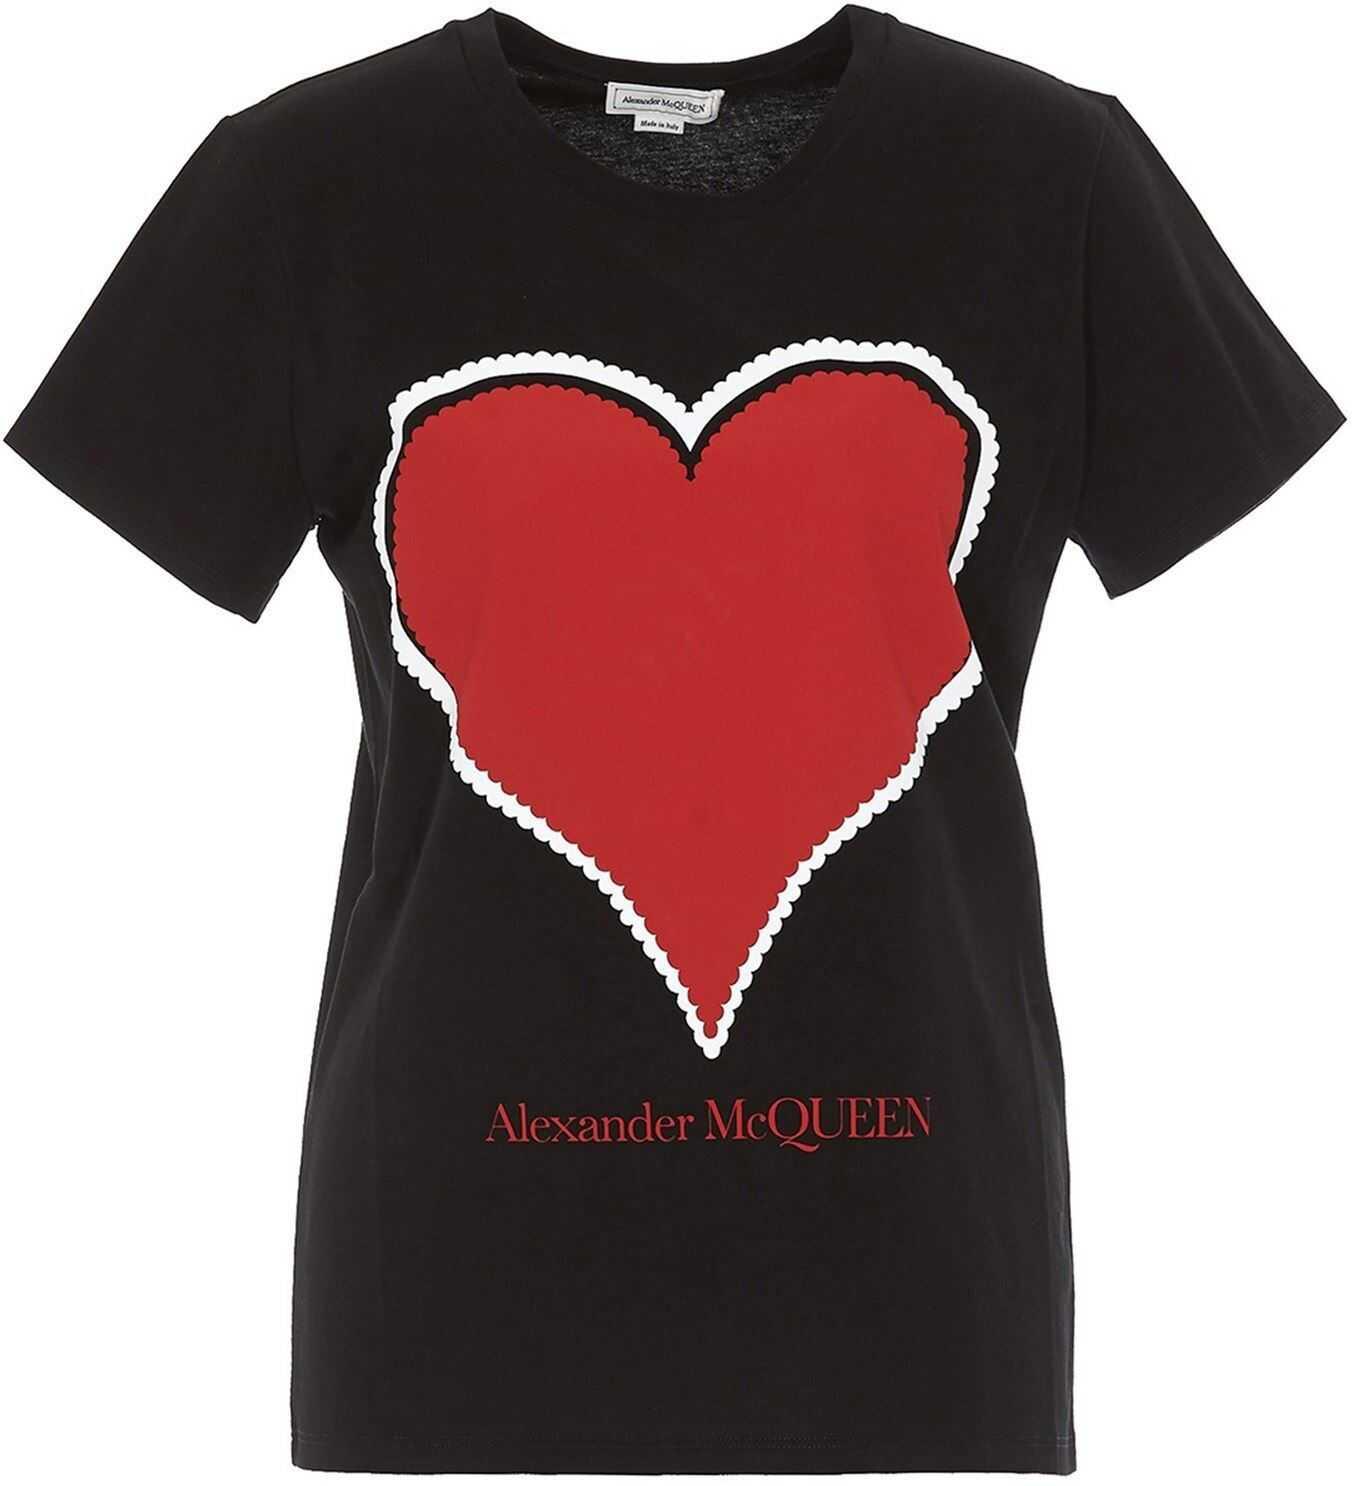 Alexander McQueen Maxi Heart T-Shirt In Black Black